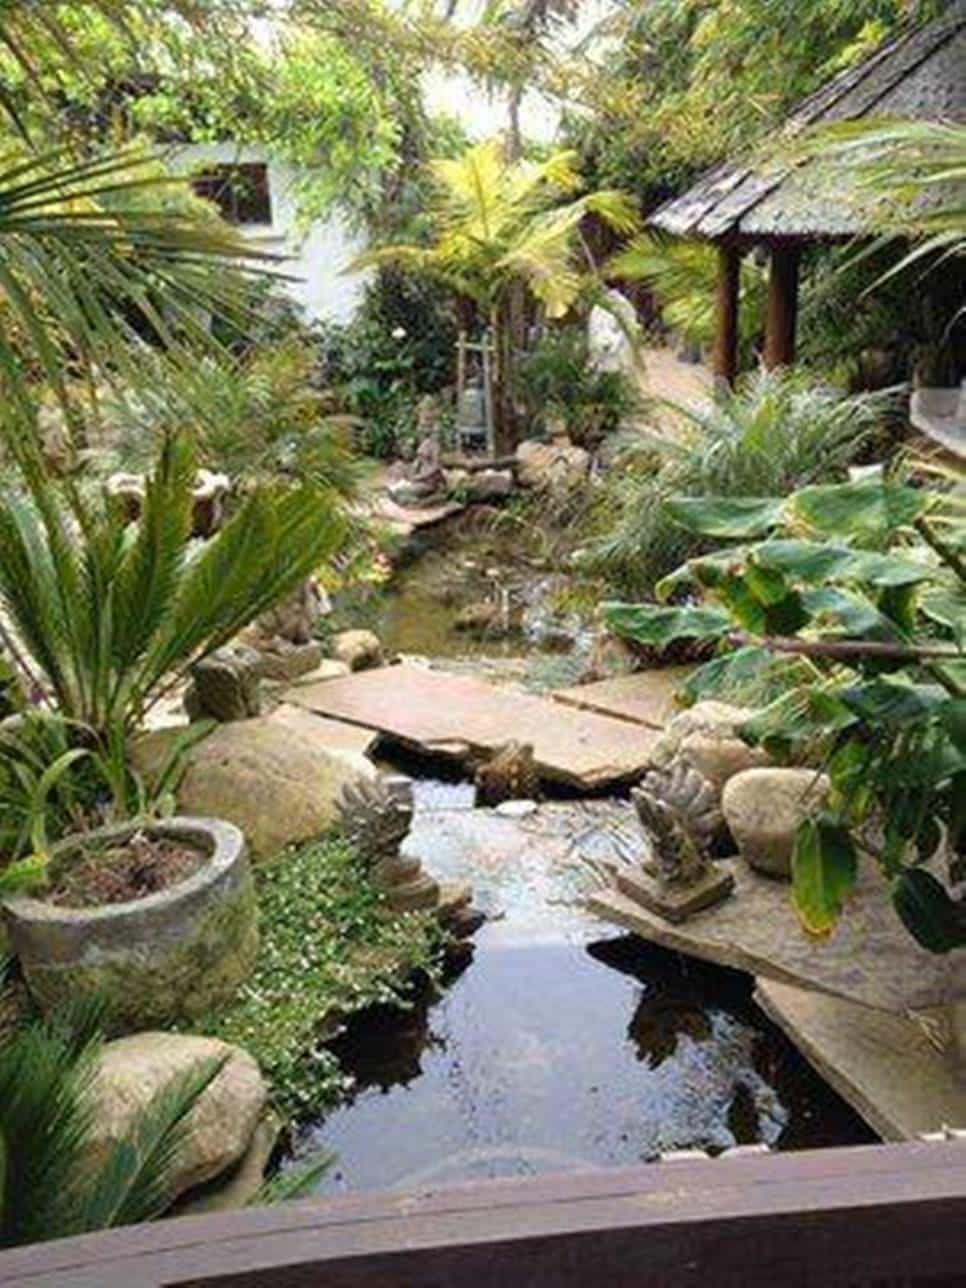 Indonesian Southeast Asian Garden Design Soothing Asian Garden Design In Garden And Lawn Cat Backyard Water Feature Asian Garden Water Features In The Garden